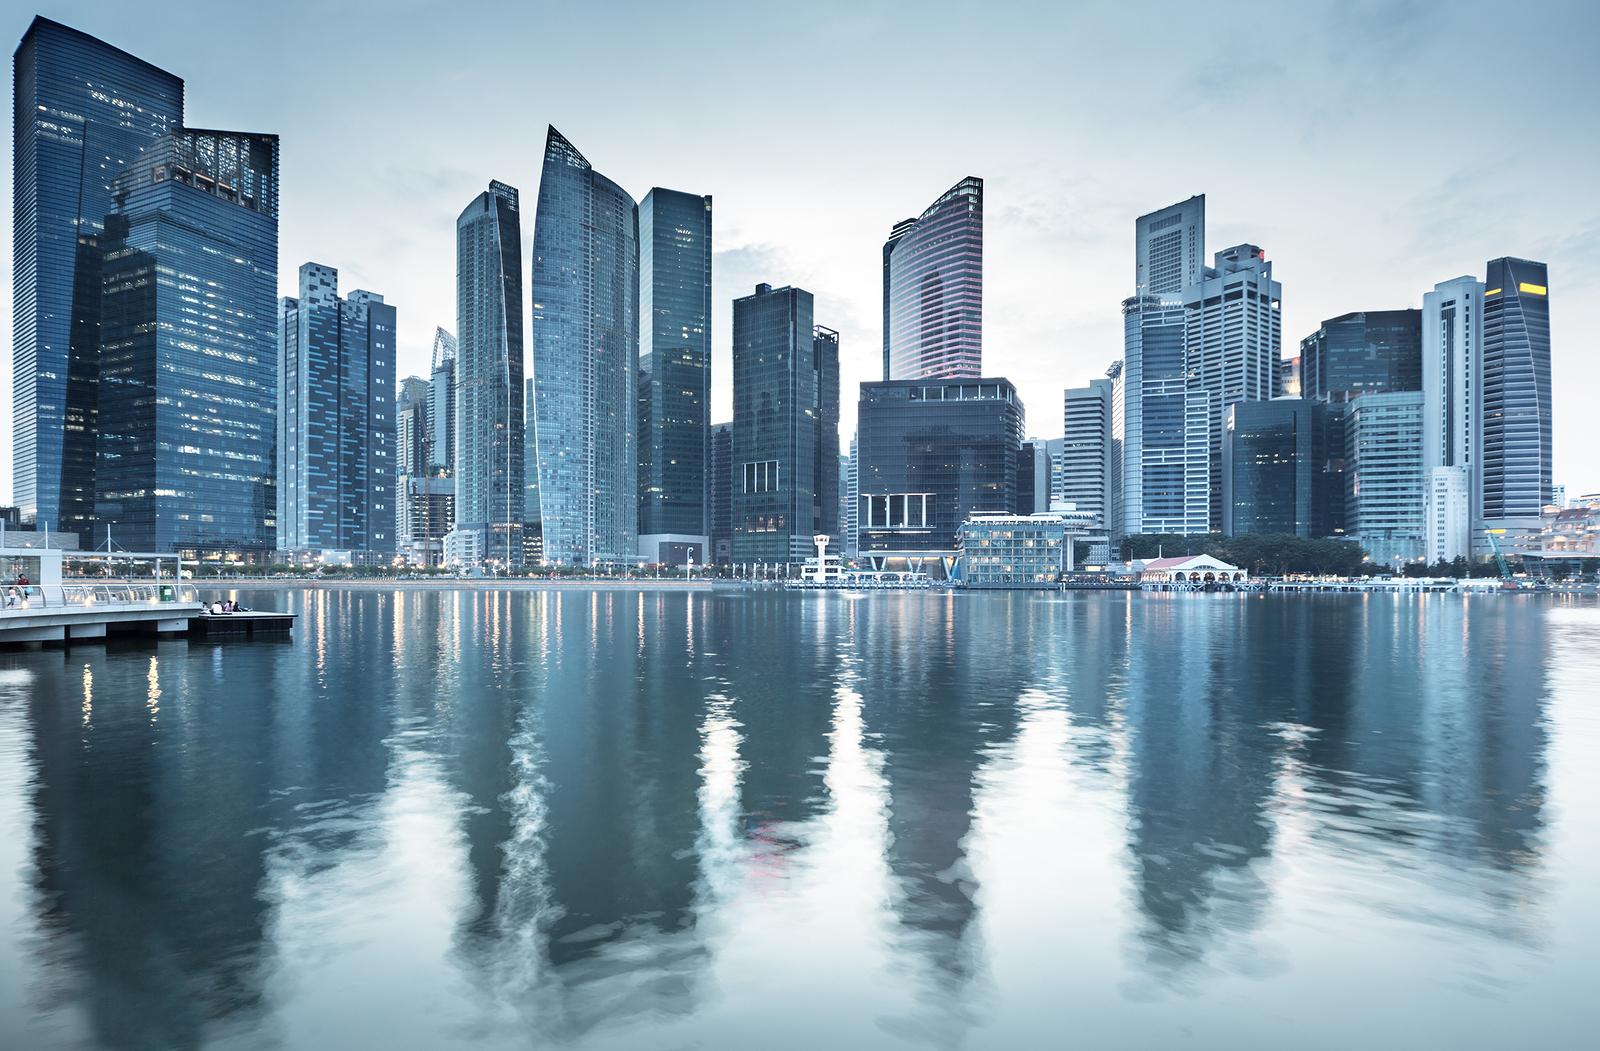 Singapore City 1